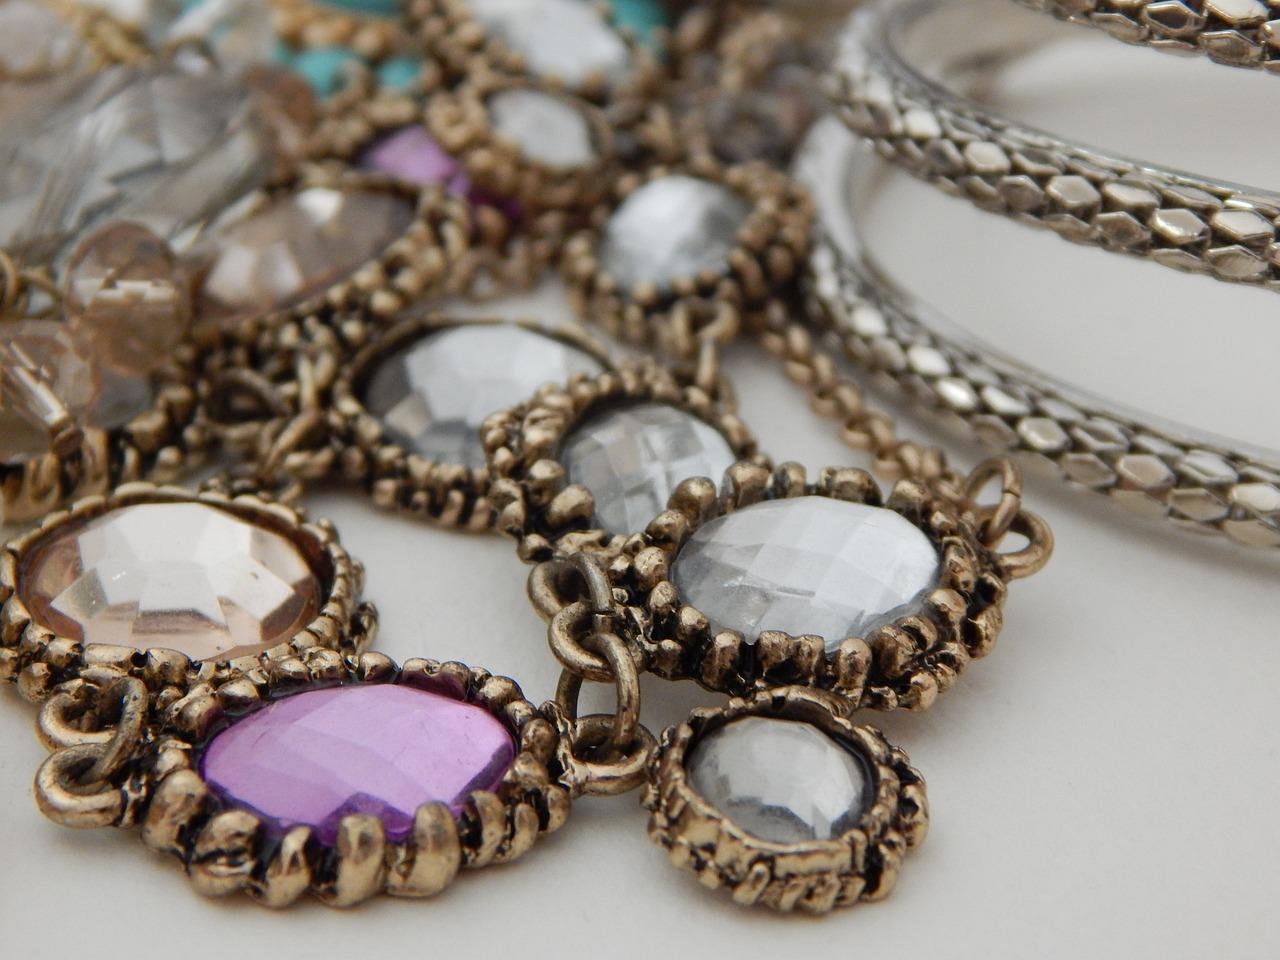 Jewelry Necklace Bracelet - Free photo on Pixabay